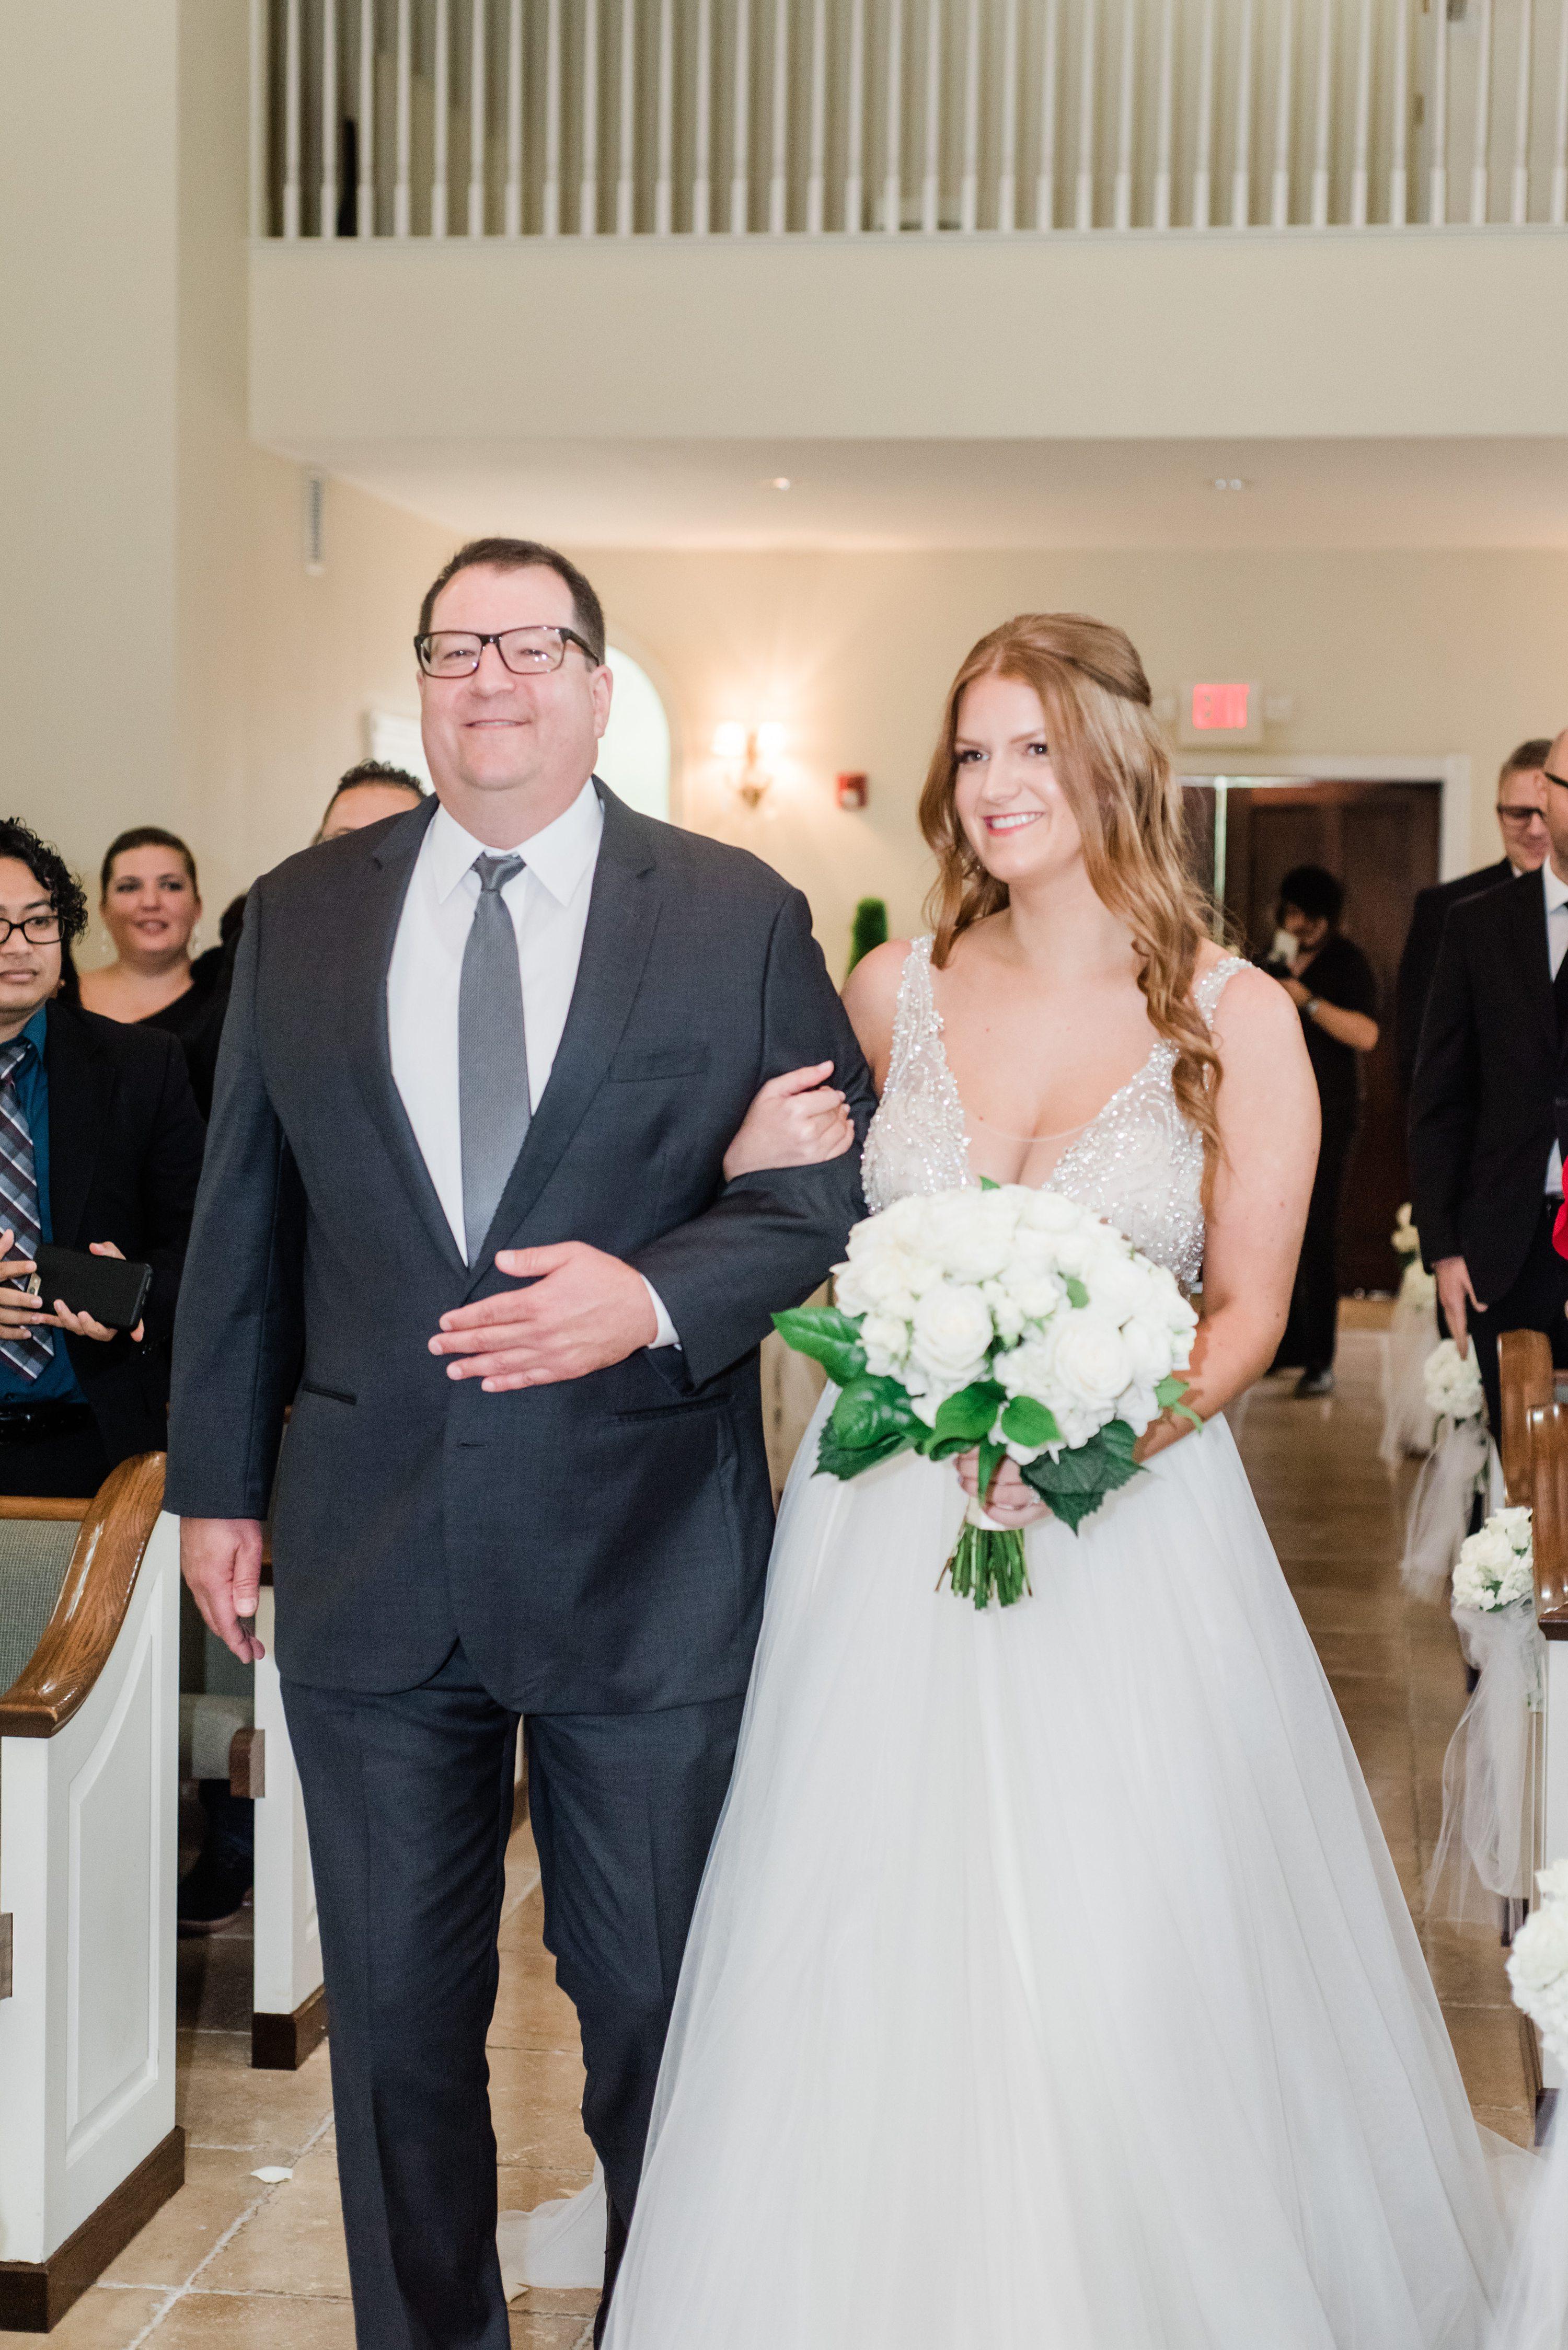 TX,Houston Wedding Photography